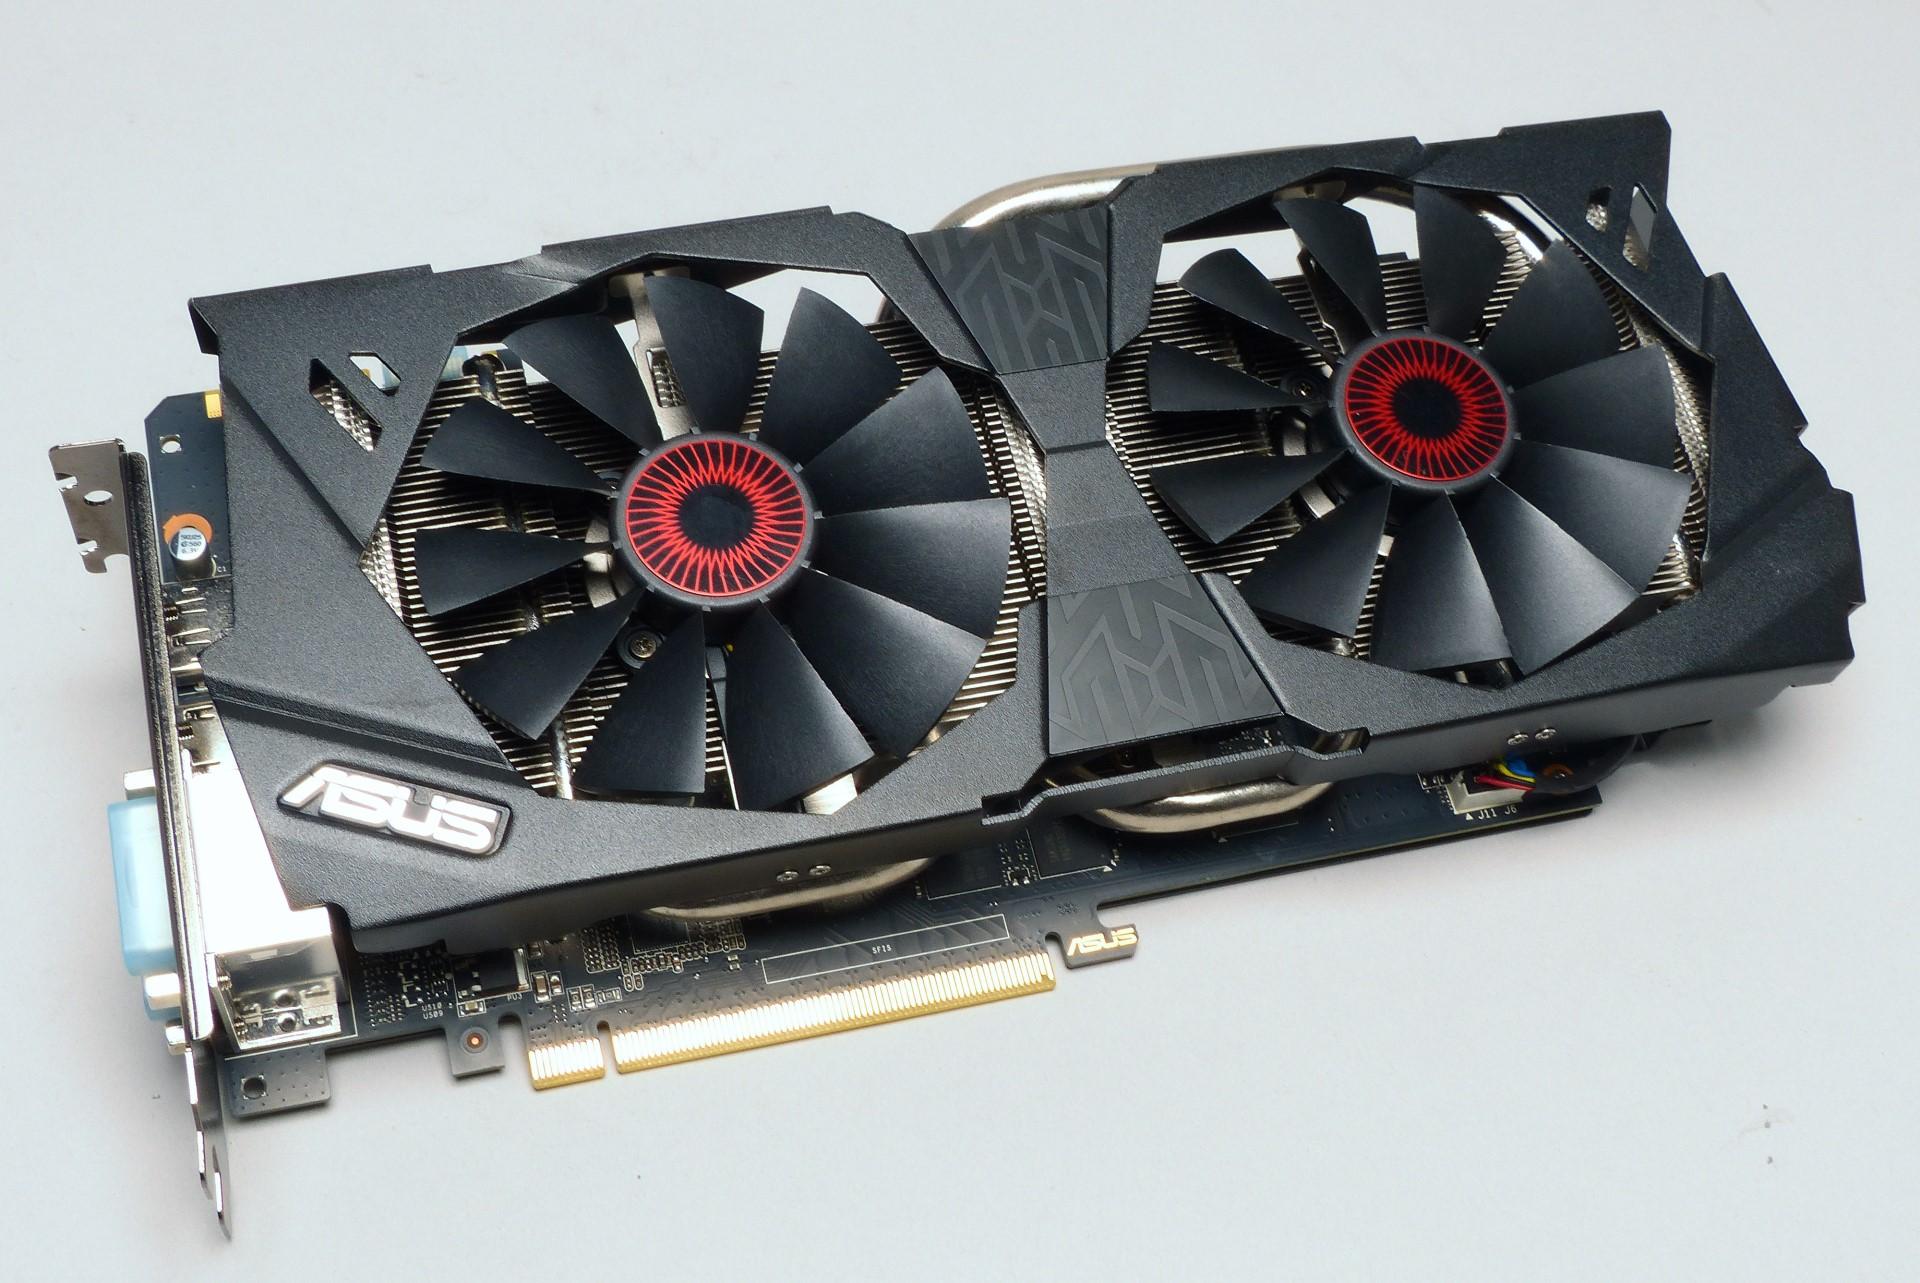 ASUS Strix GeForce GTX 970,低溫、靜音、強效3合一